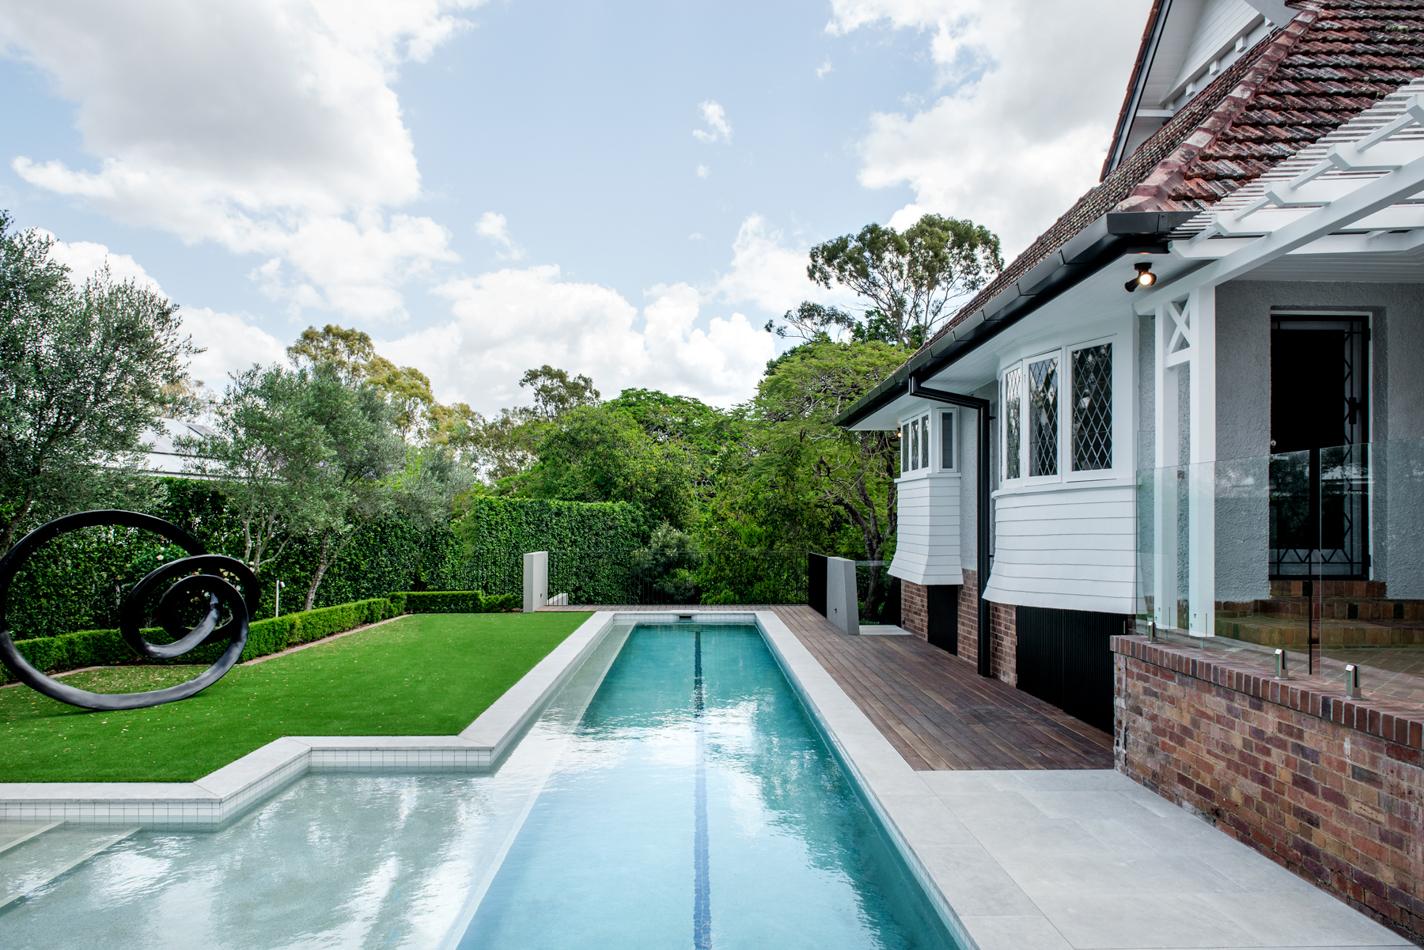 the-terrace-shaun-lockyer-architects-the-design-emotive-25.jpg